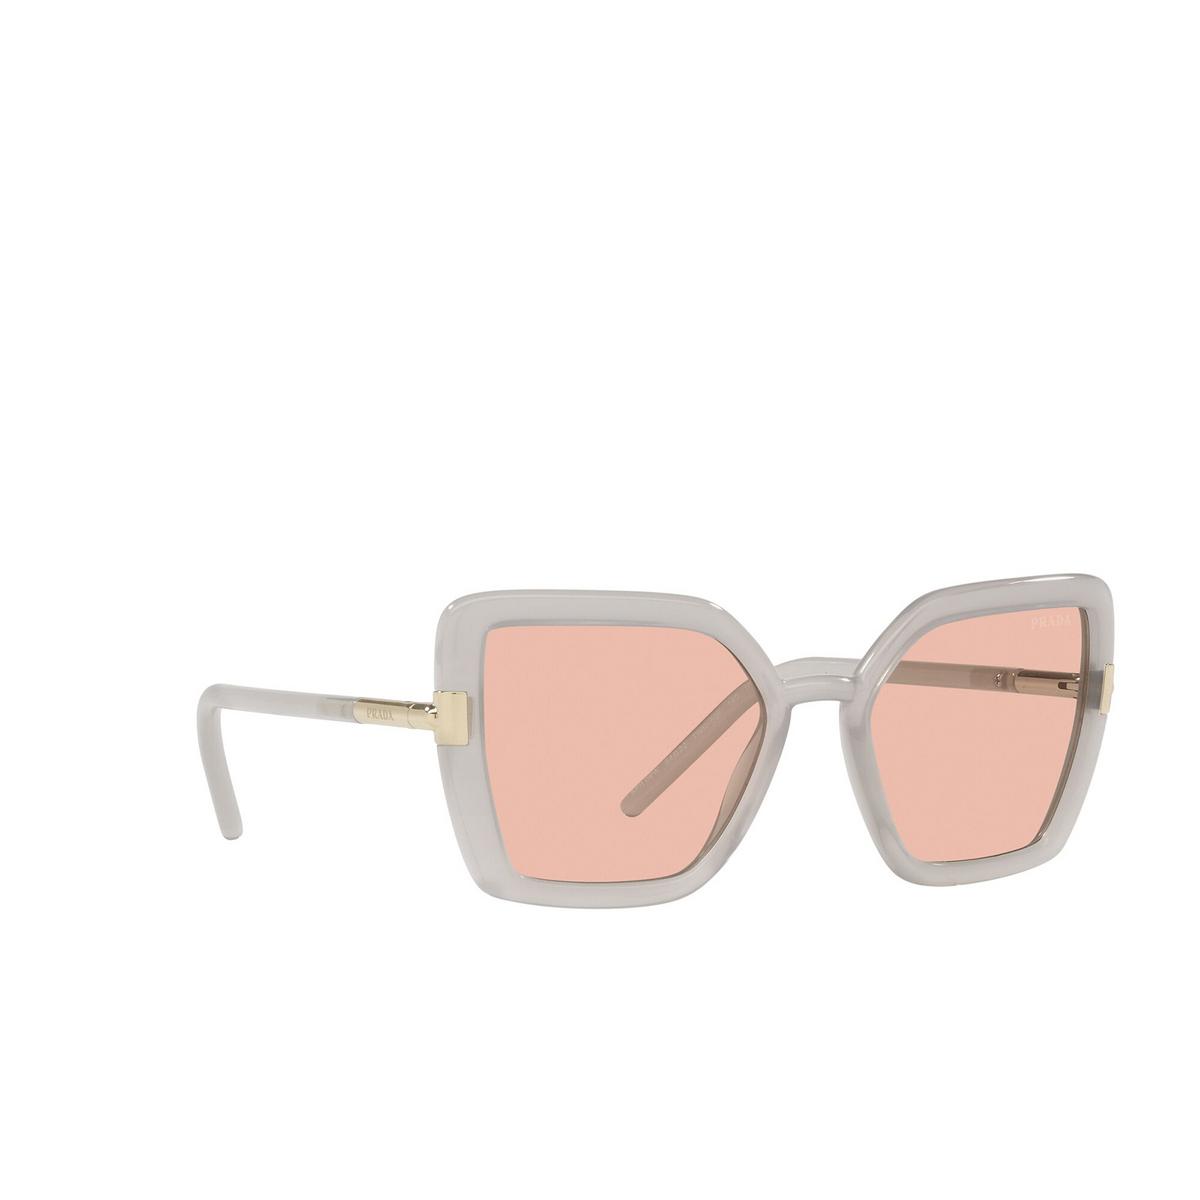 Prada® Butterfly Sunglasses: PR 09WS color Opal Grey TWH03F - three-quarters view.